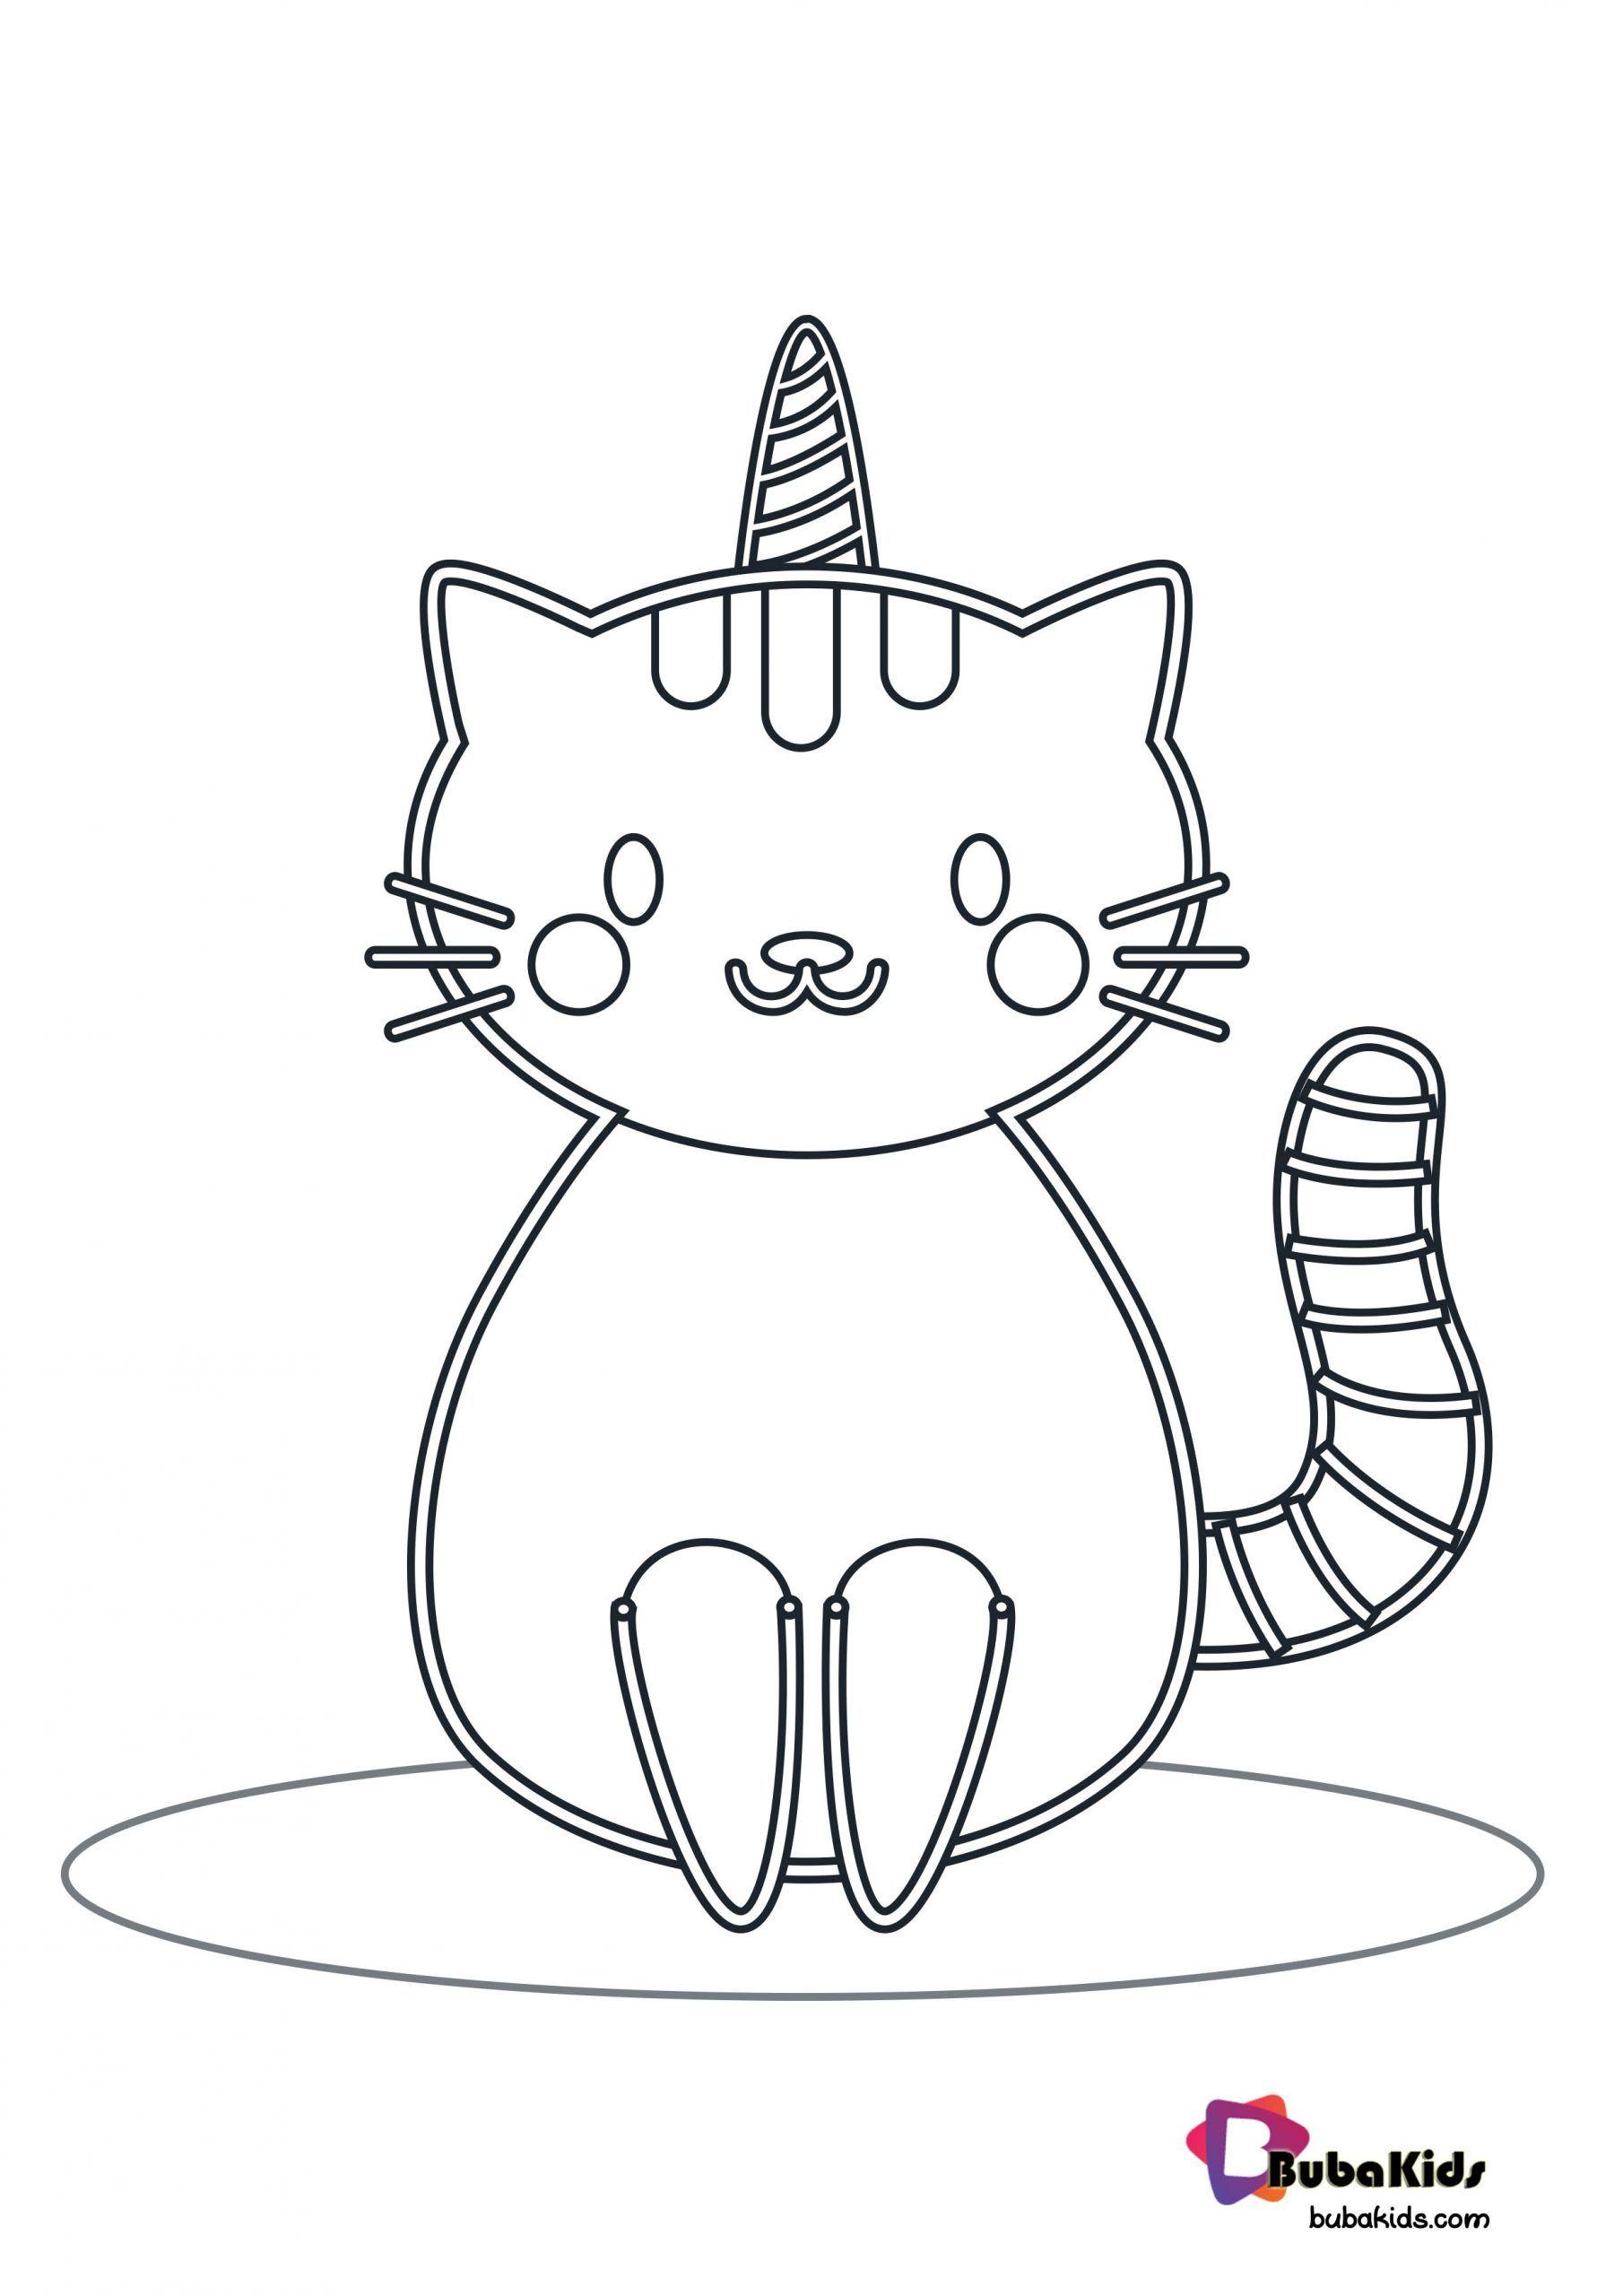 Unicorn Cat Coloring Page Cuadernos